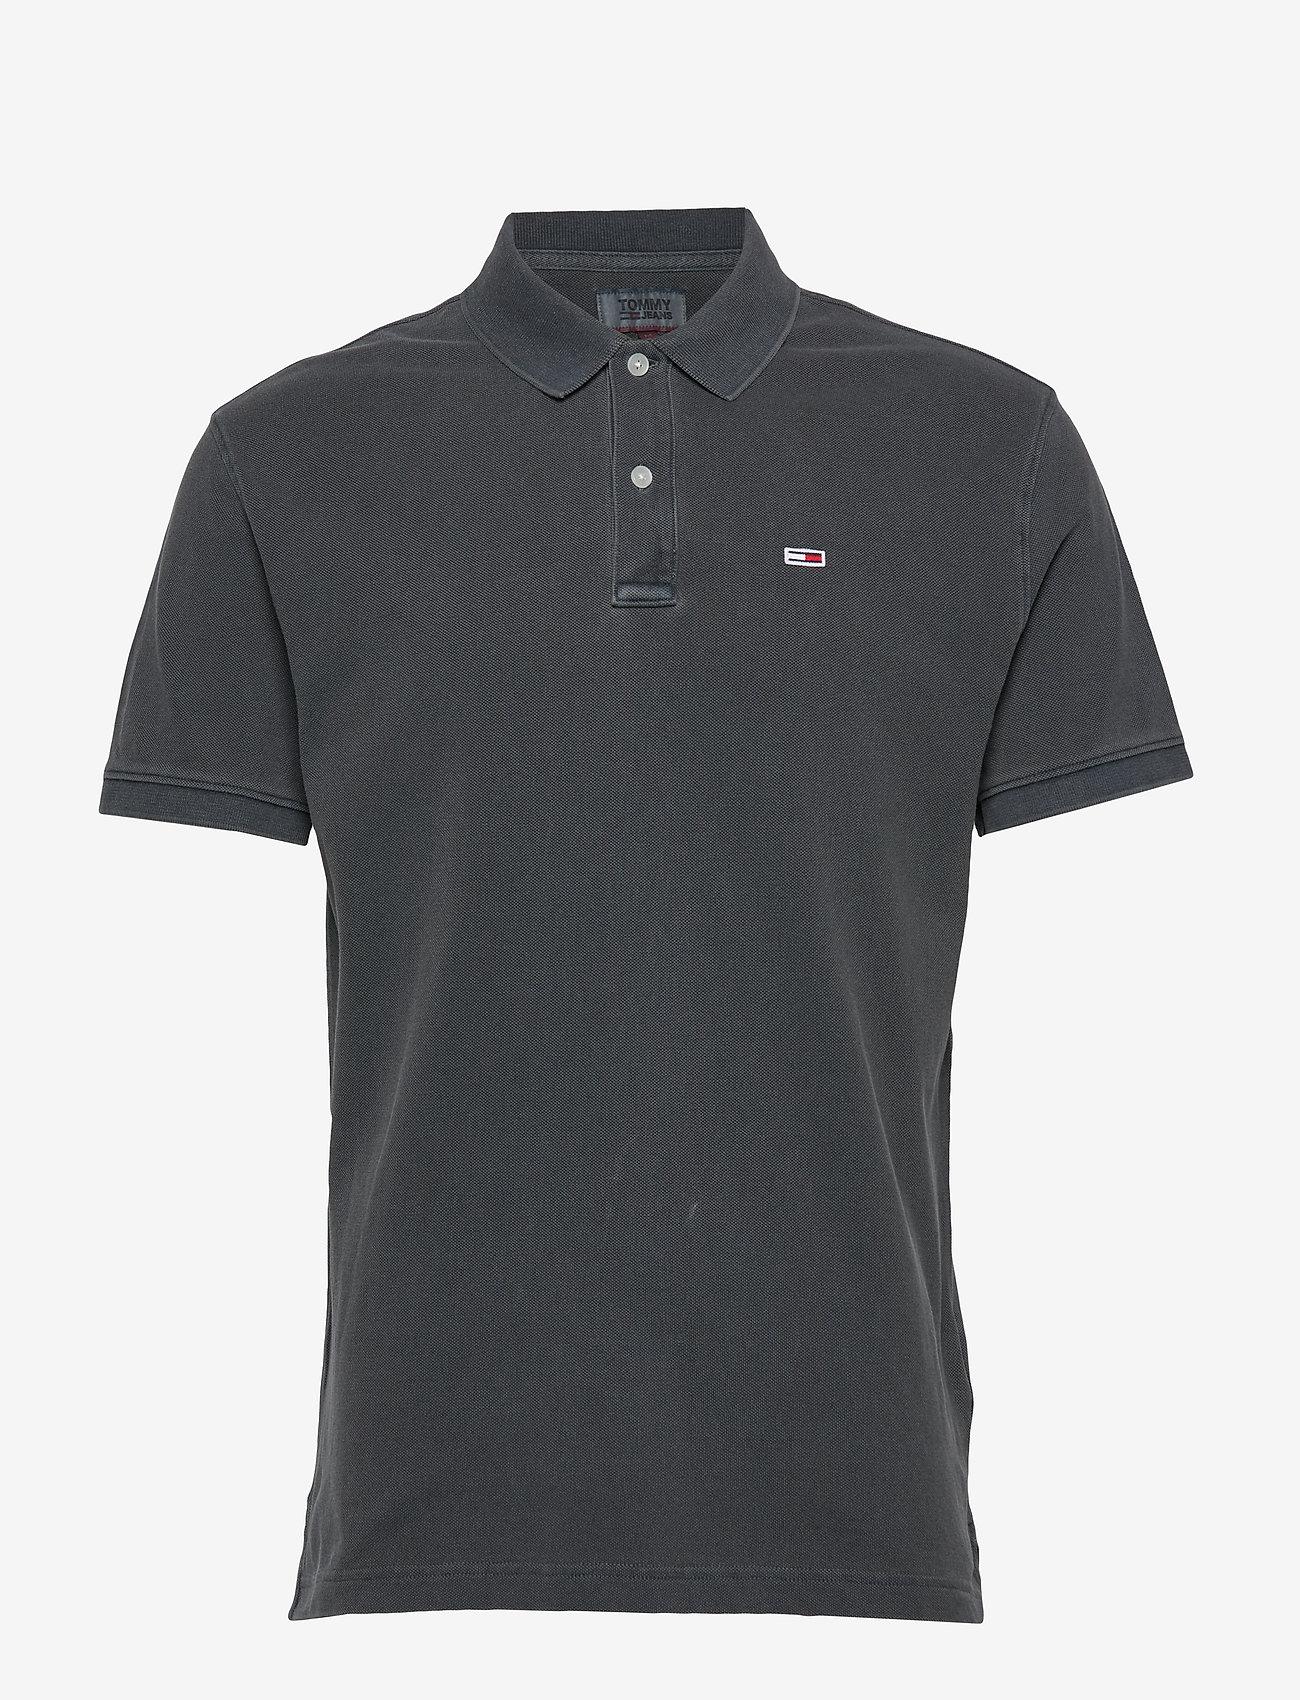 Tommy Jeans - TJM GARMENT DYE POLO - short-sleeved polos - black - 0